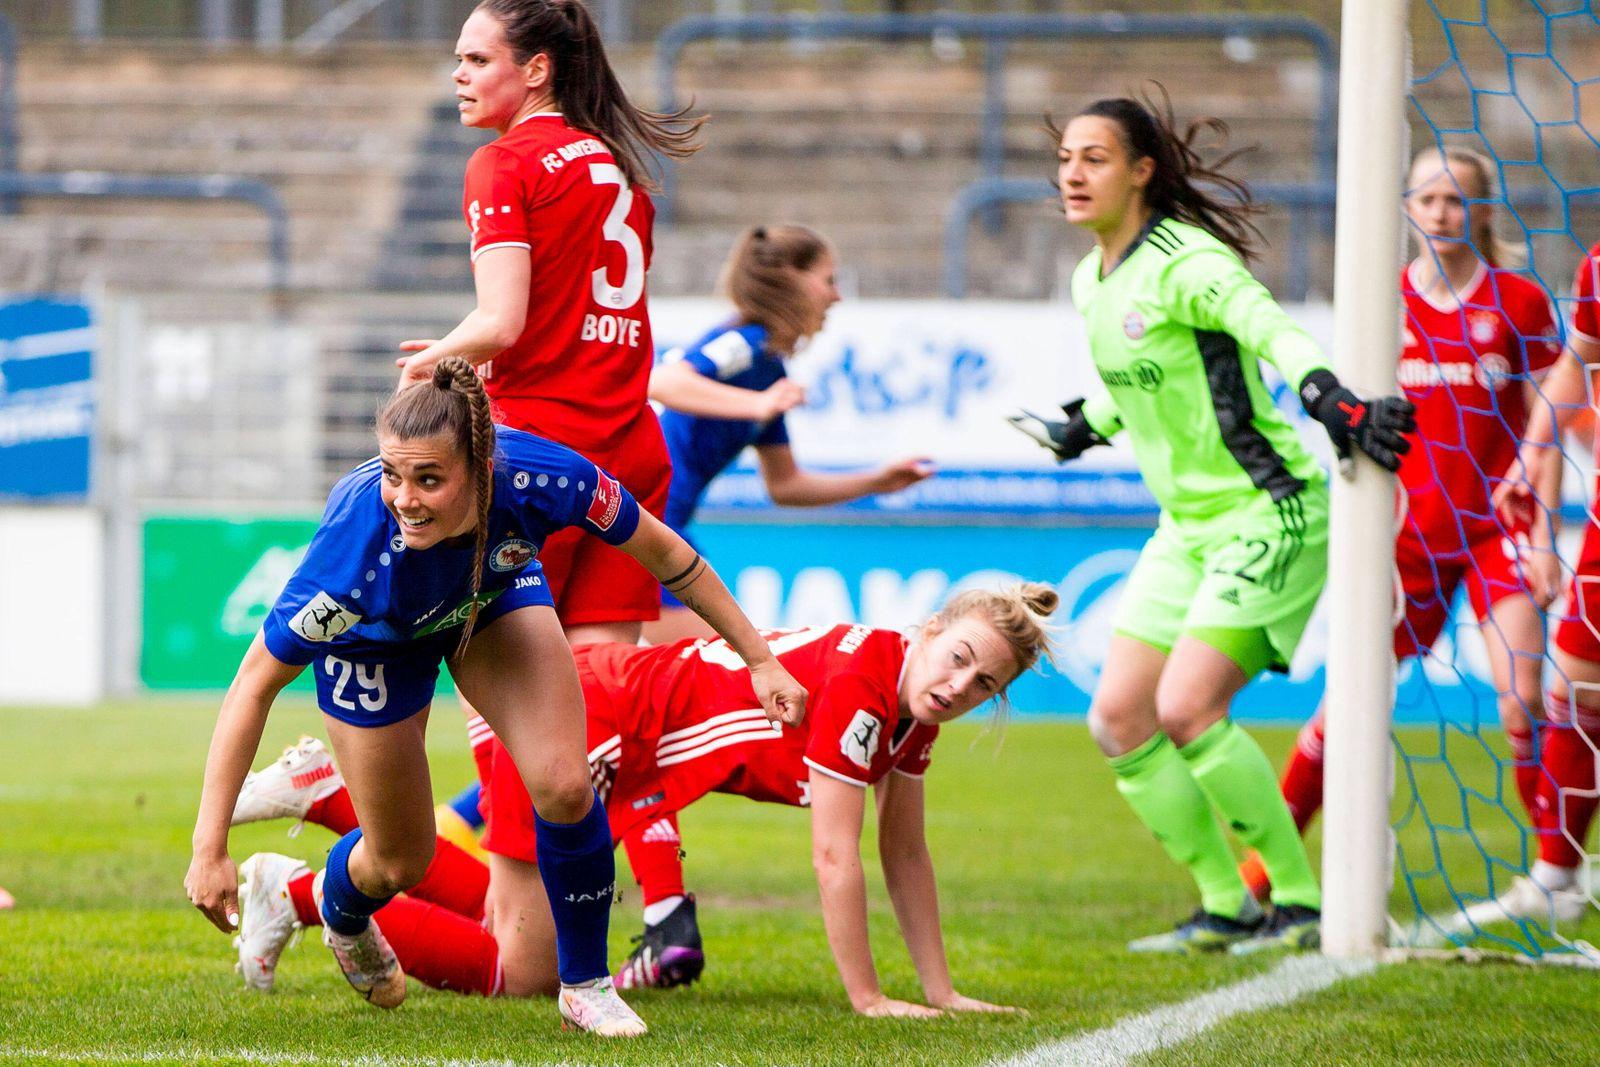 21.04.2021, xfrx, Fussball 1.Bundesliga Damen, Turbine Potsdam - FC Bayern Muenchen emspor, v.l. Selina Cerci (1.FFC Tur